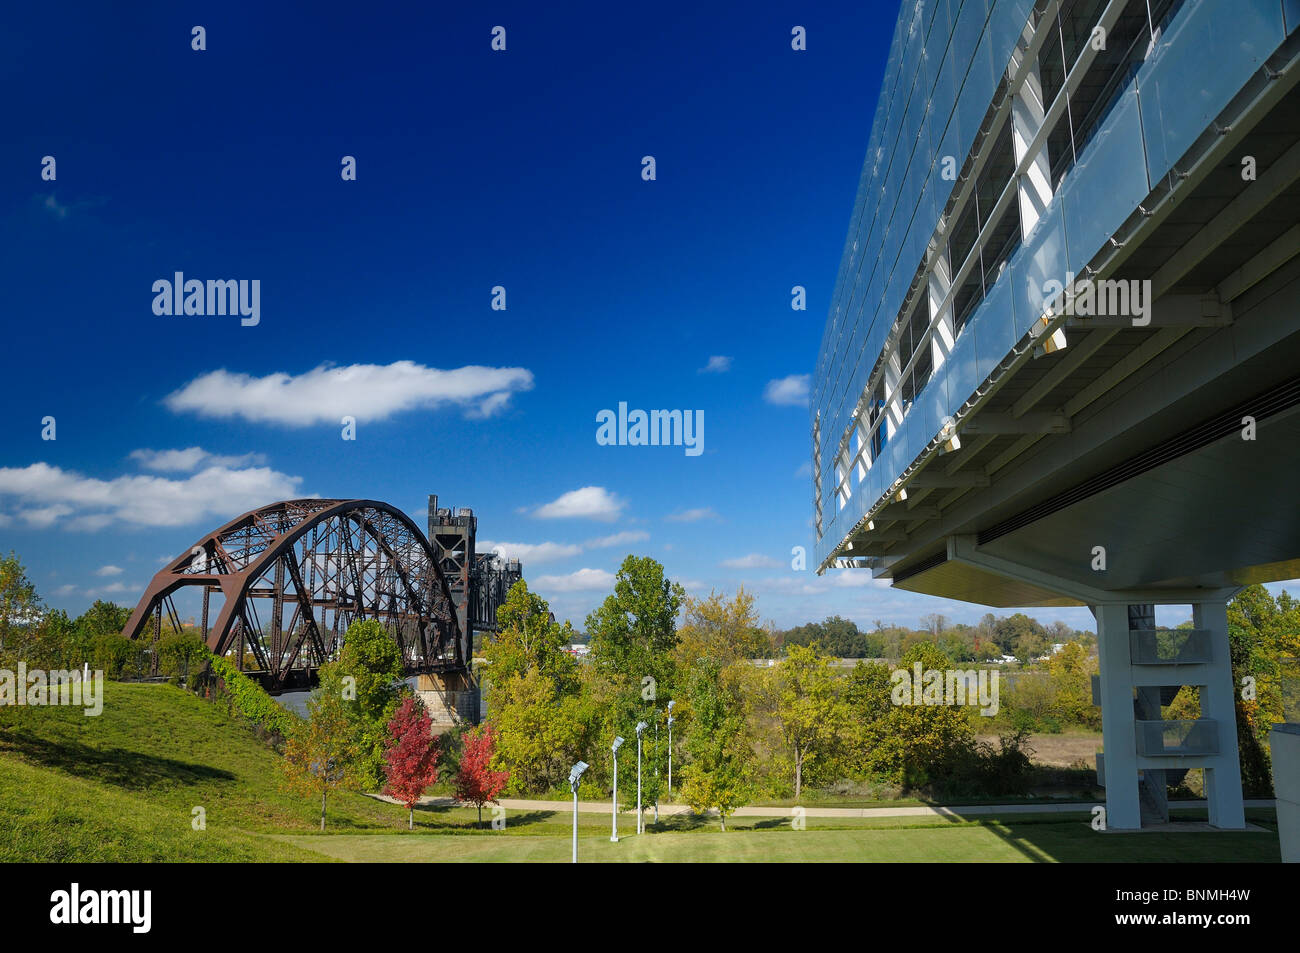 William J. Clinton Presidential Center & Park Library Exterior Little Rock Arkansas USA park bridge architecture - Stock Image